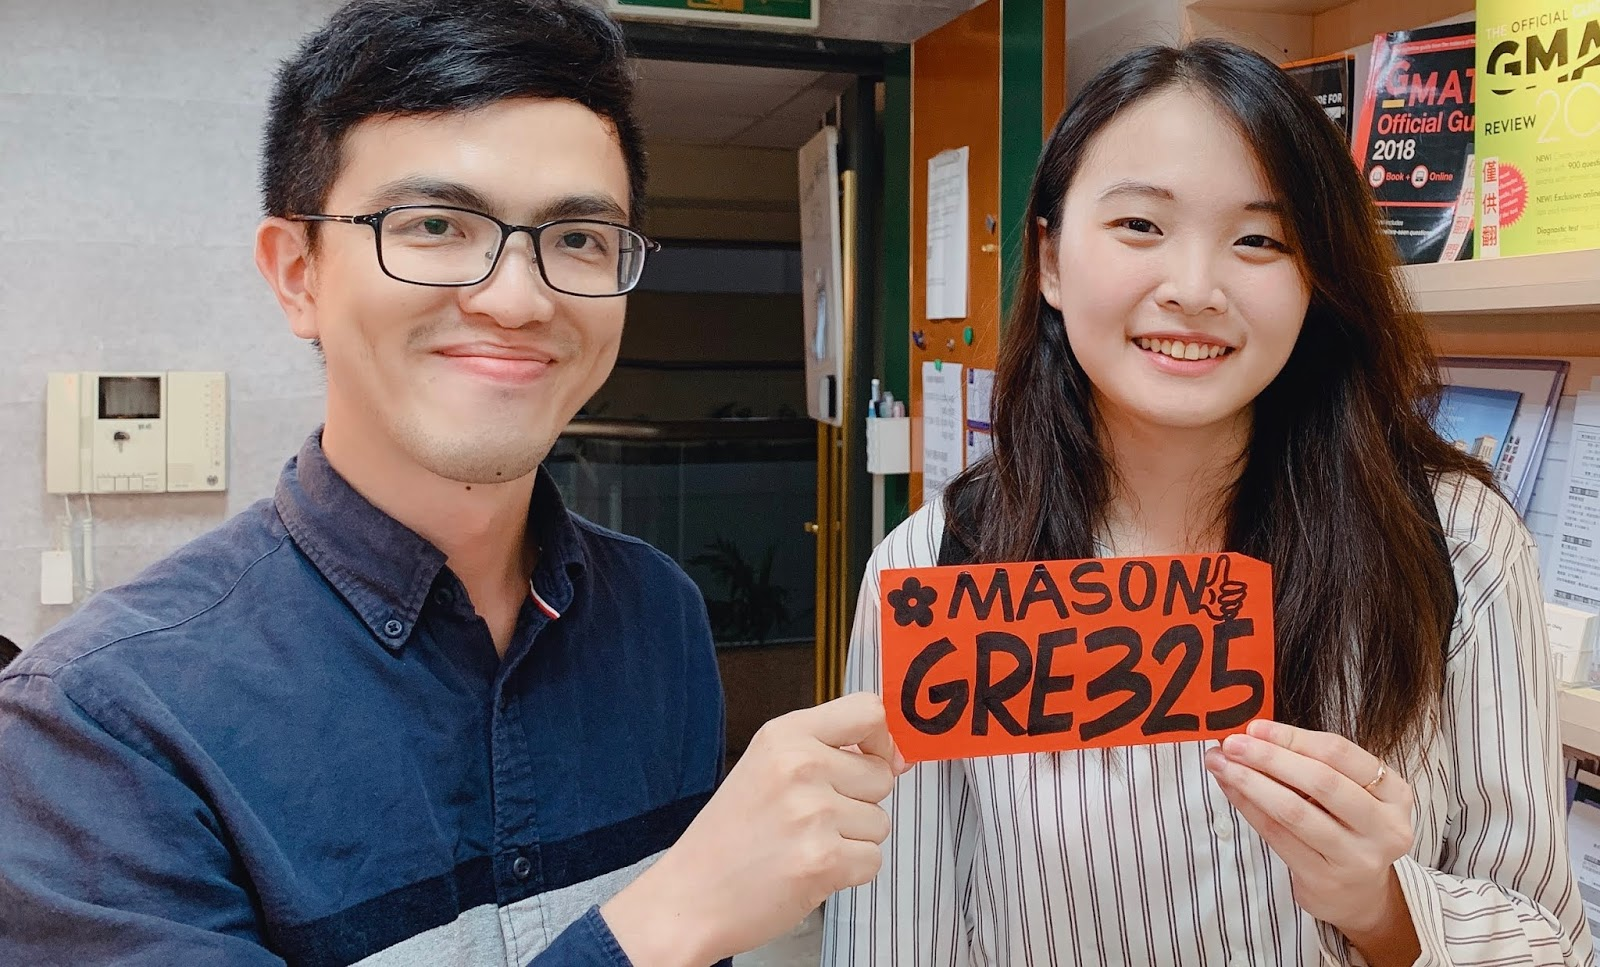 Mason GRE: 政大國貿上班族 GRE一戰325 作文AW4.0 感謝Mason GRE